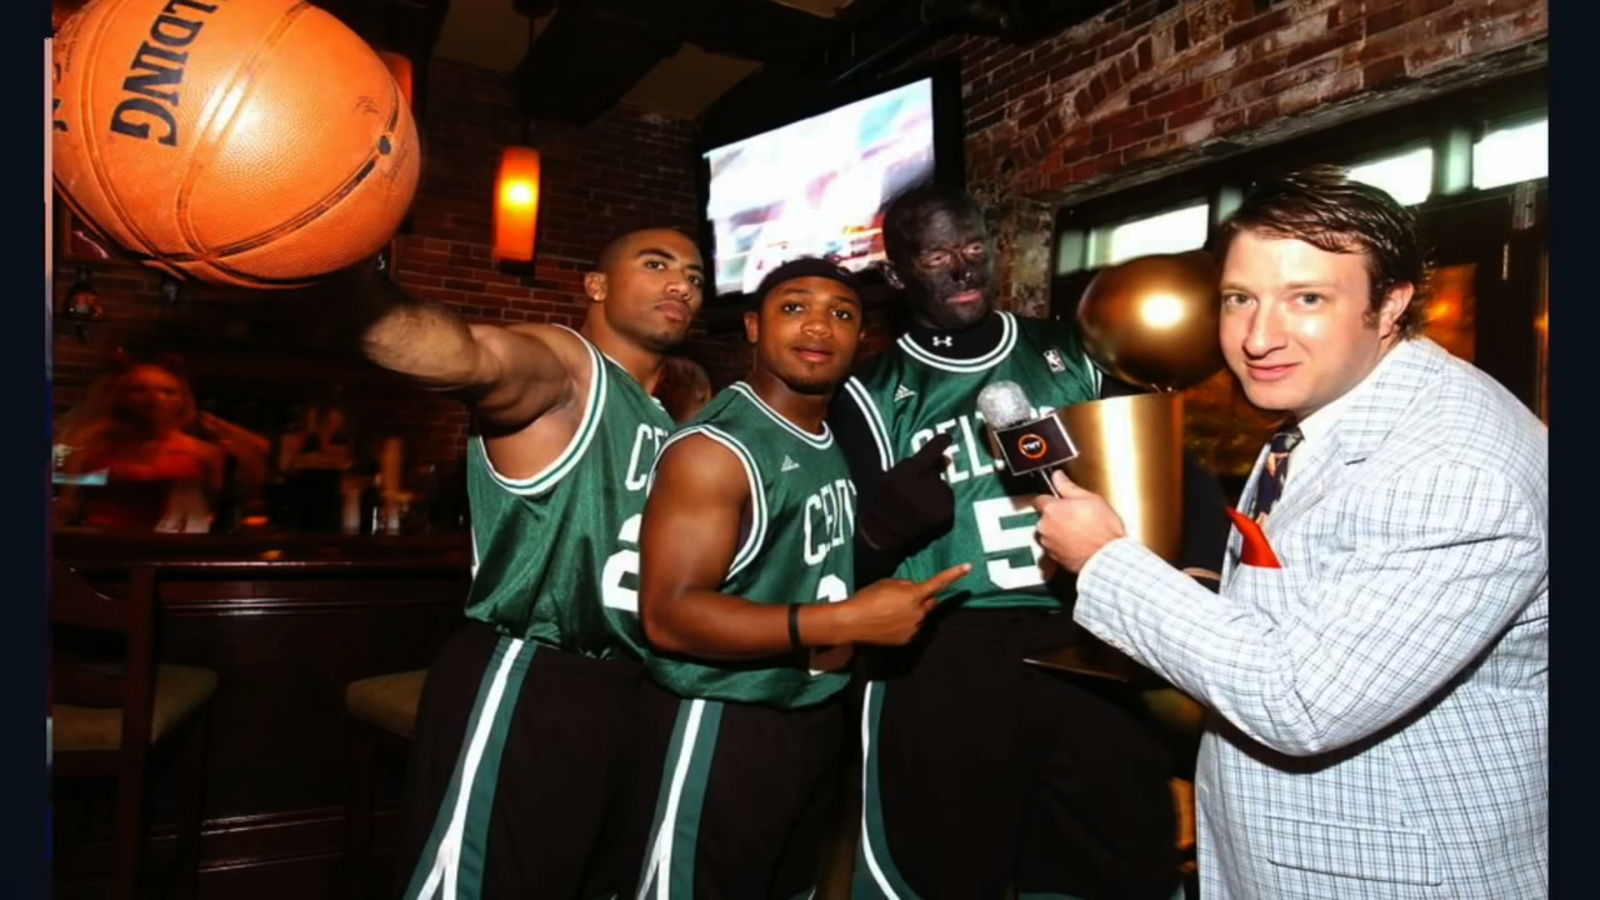 The Barstool Sports Gang Had A Blackface Whoopsie